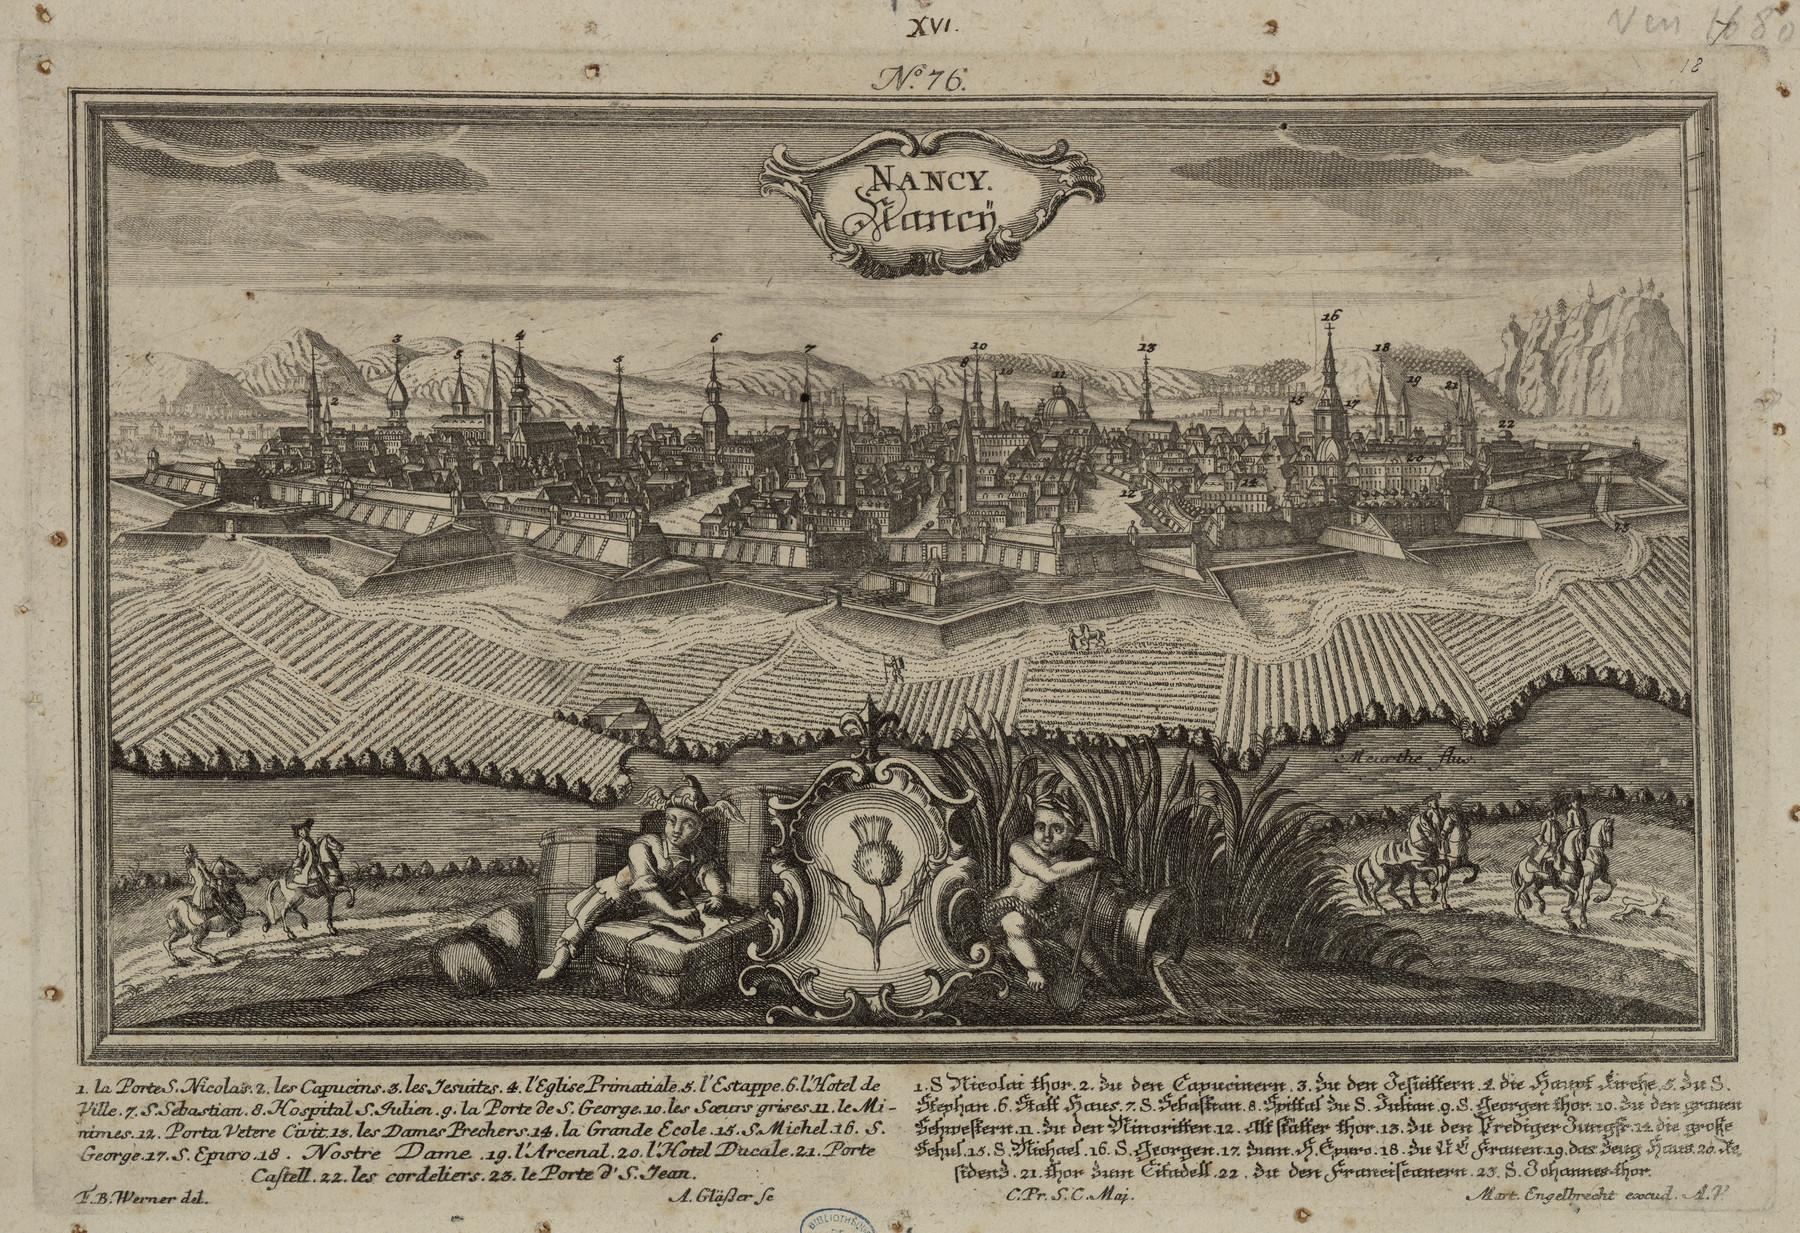 Contenu du Nancy. Gravure allemande du XVIIIe siècle